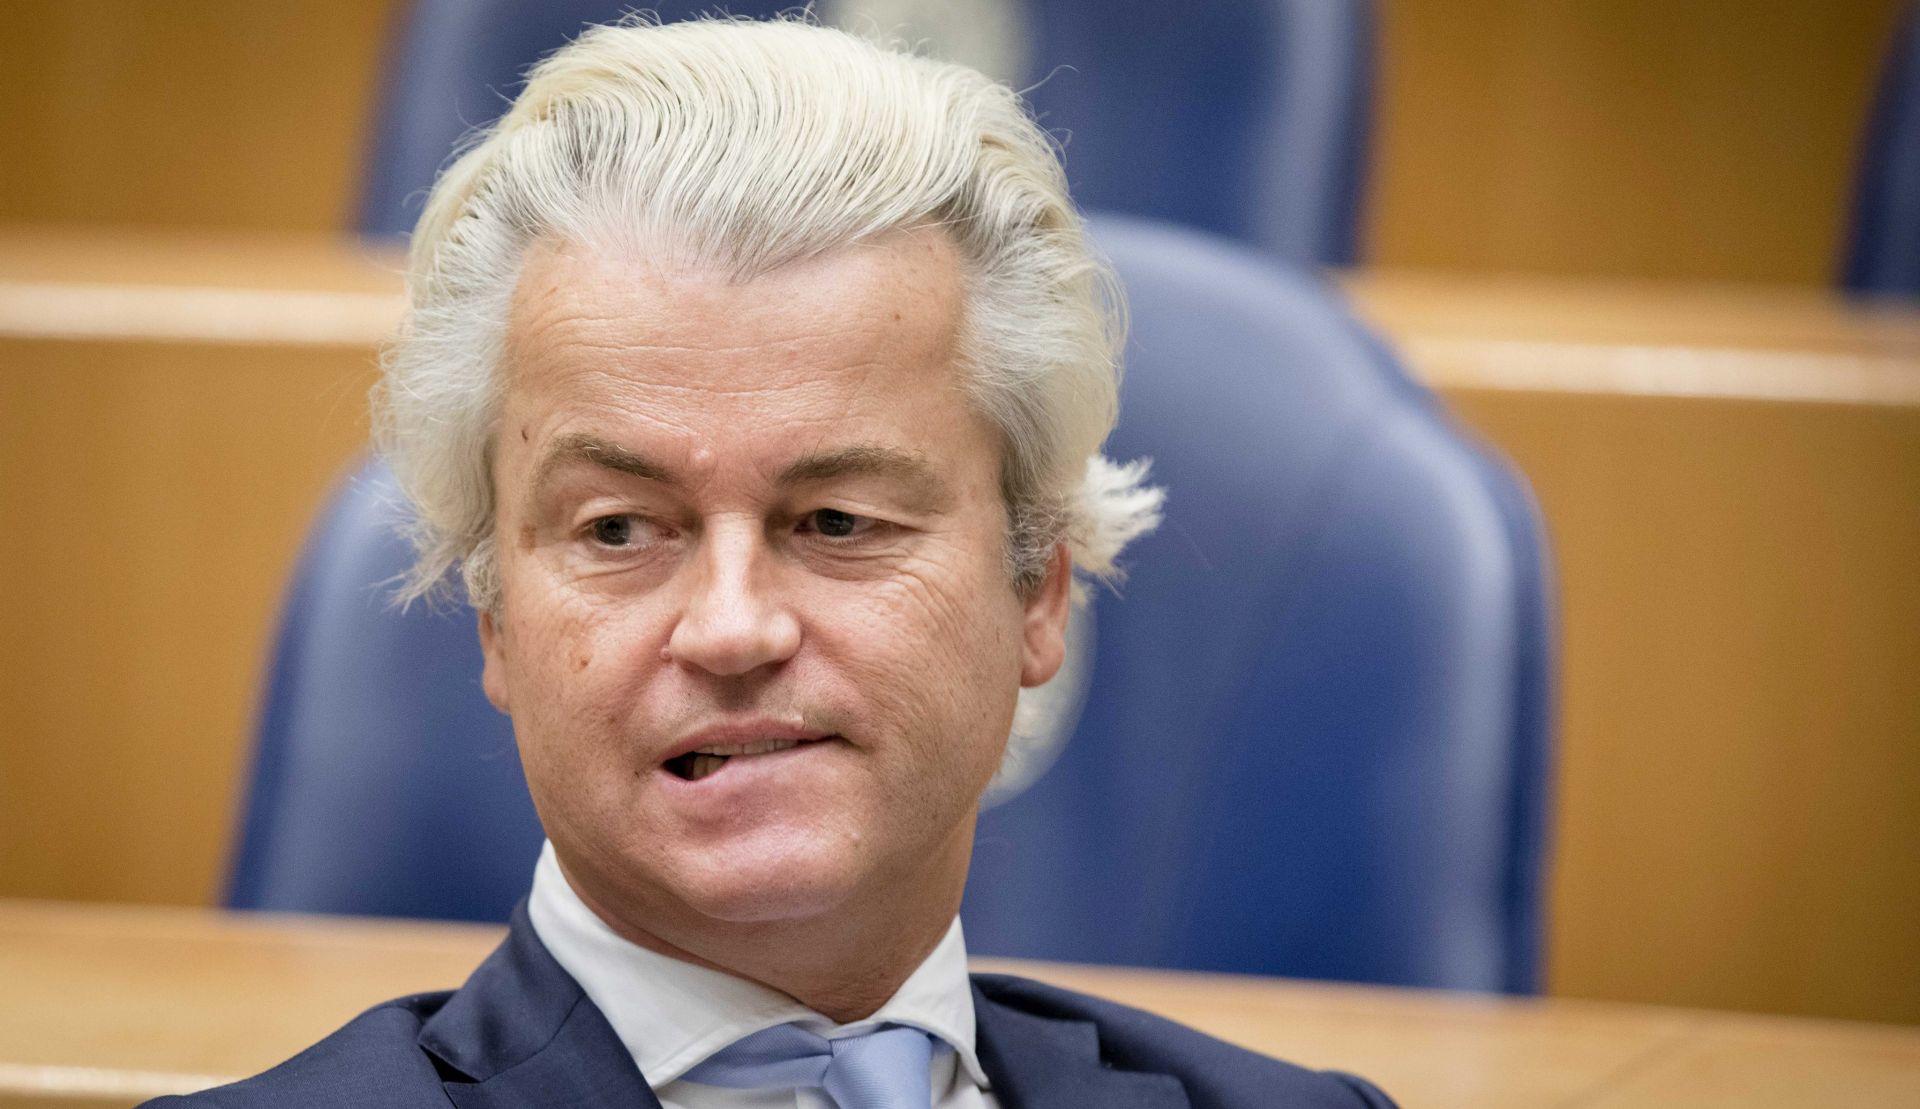 NIZOZEMSKA Geertu Wildersu pada popularnost